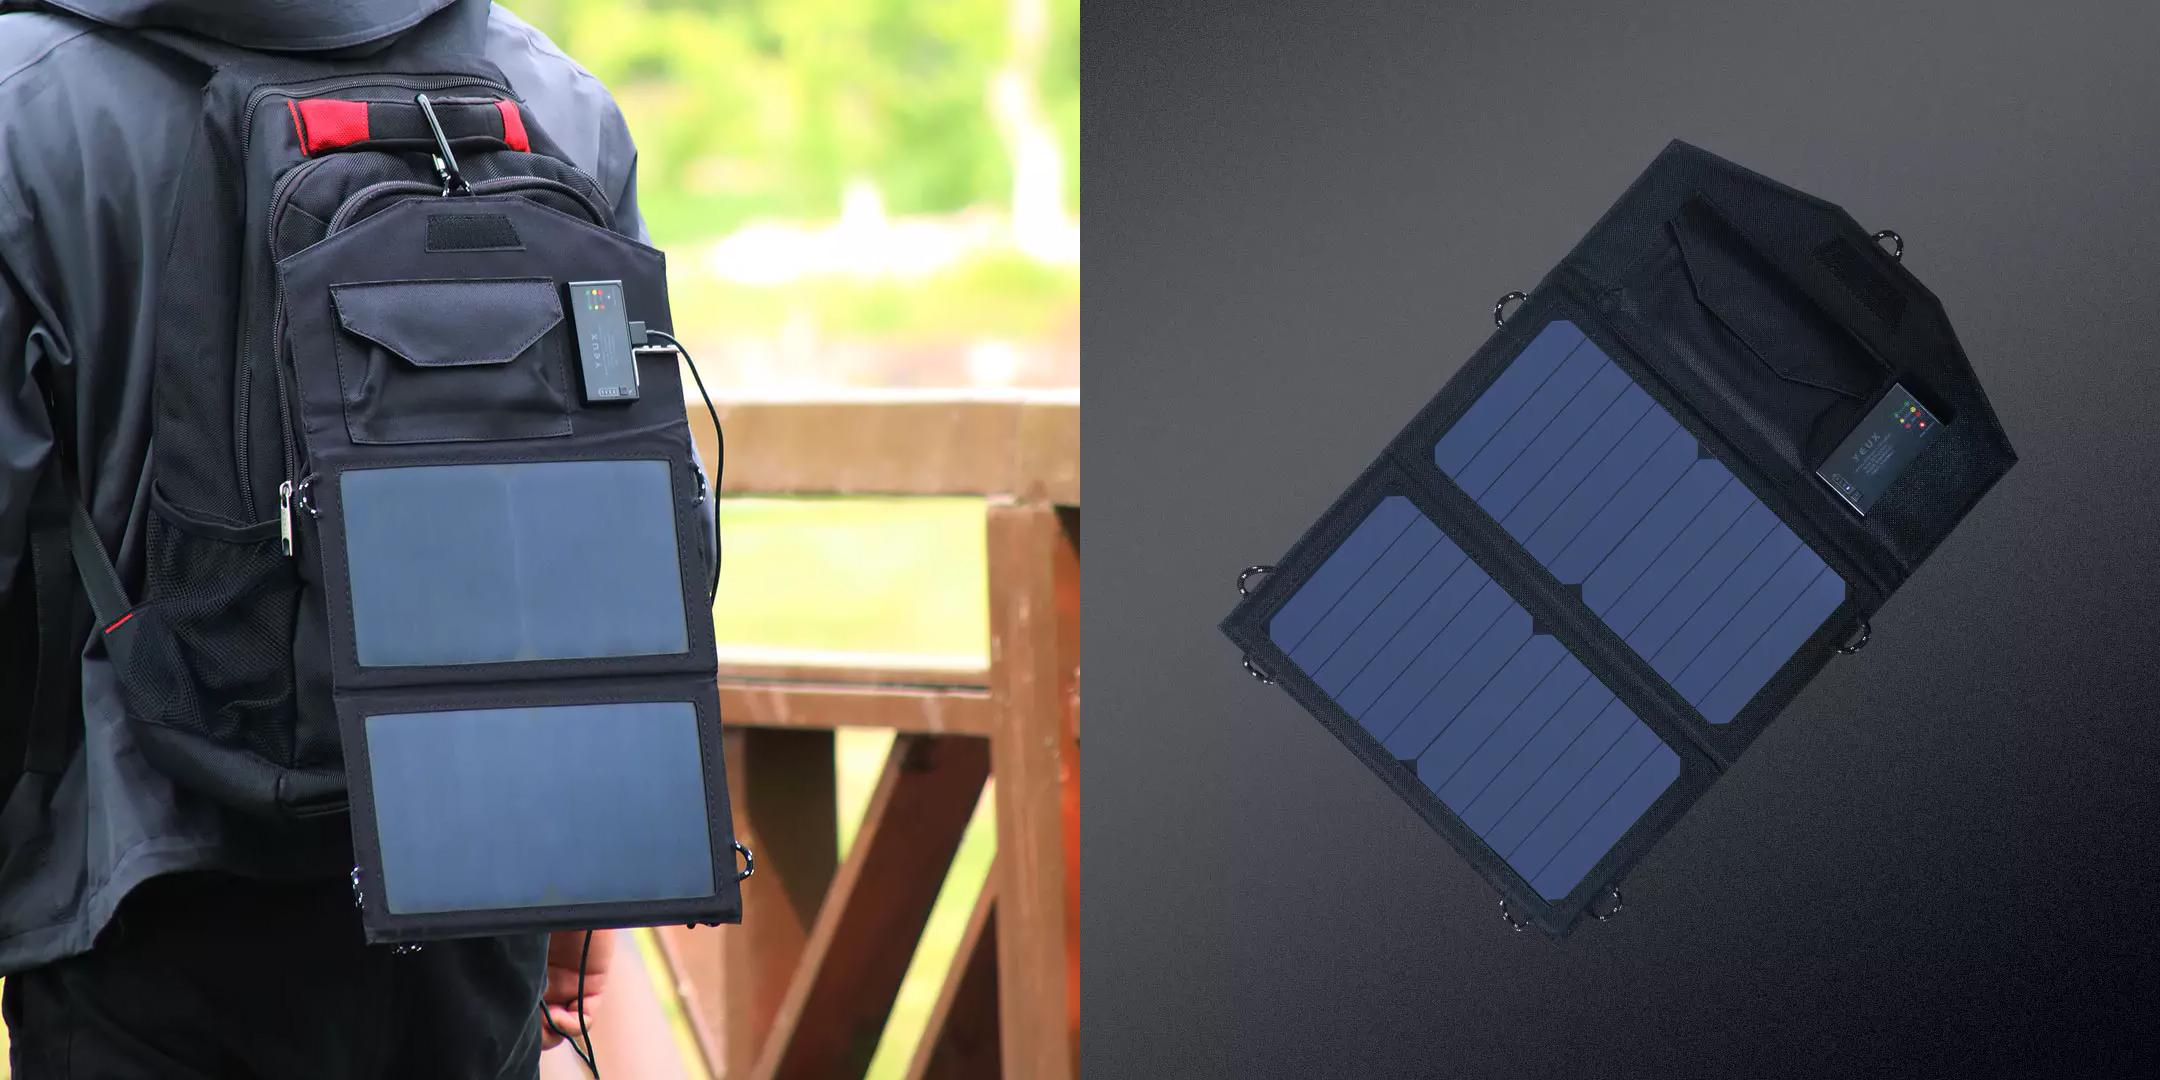 солнечные панели аккумулятор